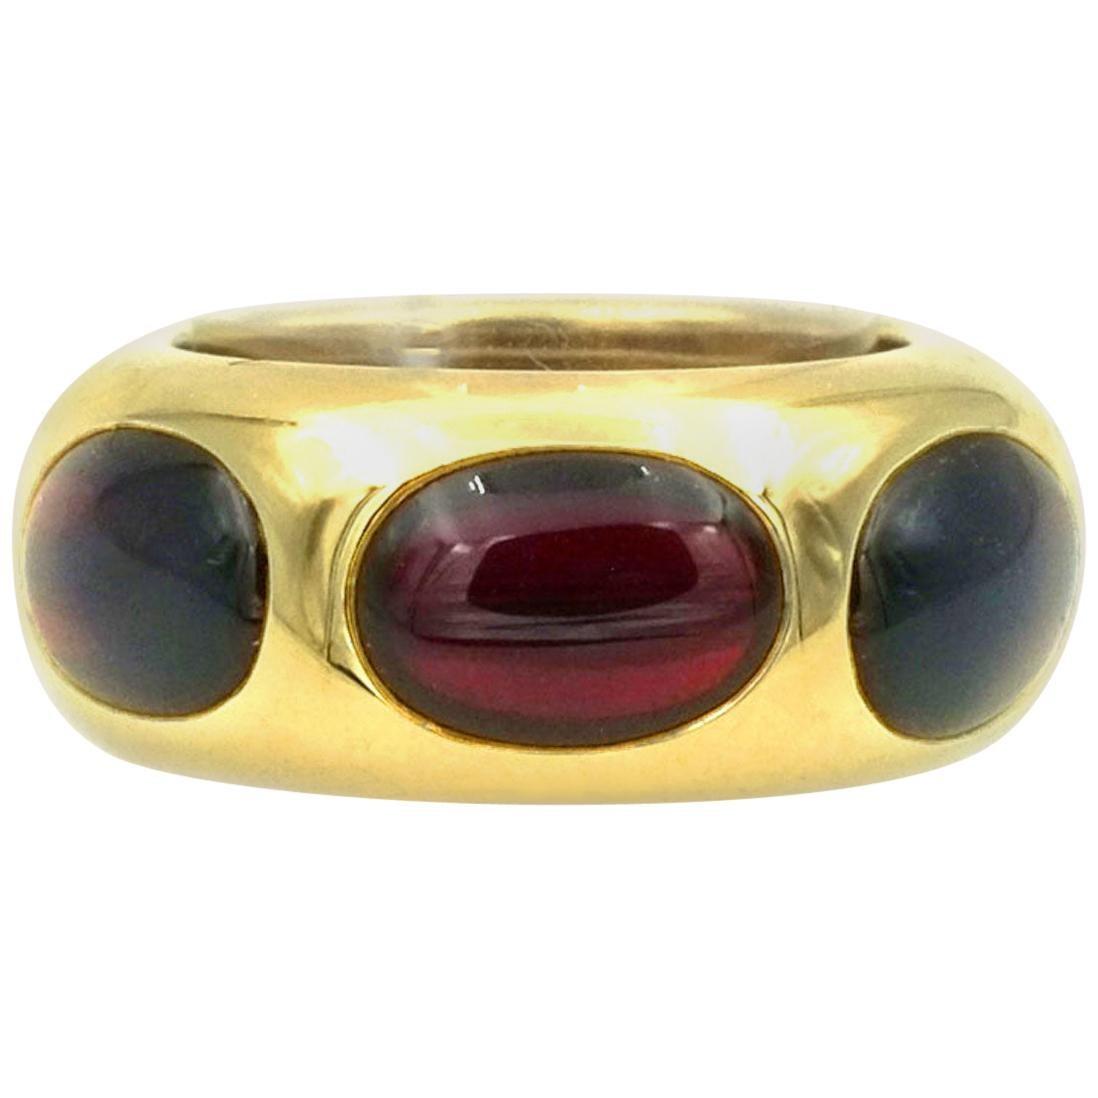 Pomellato 18 Karat Yellow Gold Rubelite Cabochon Ring